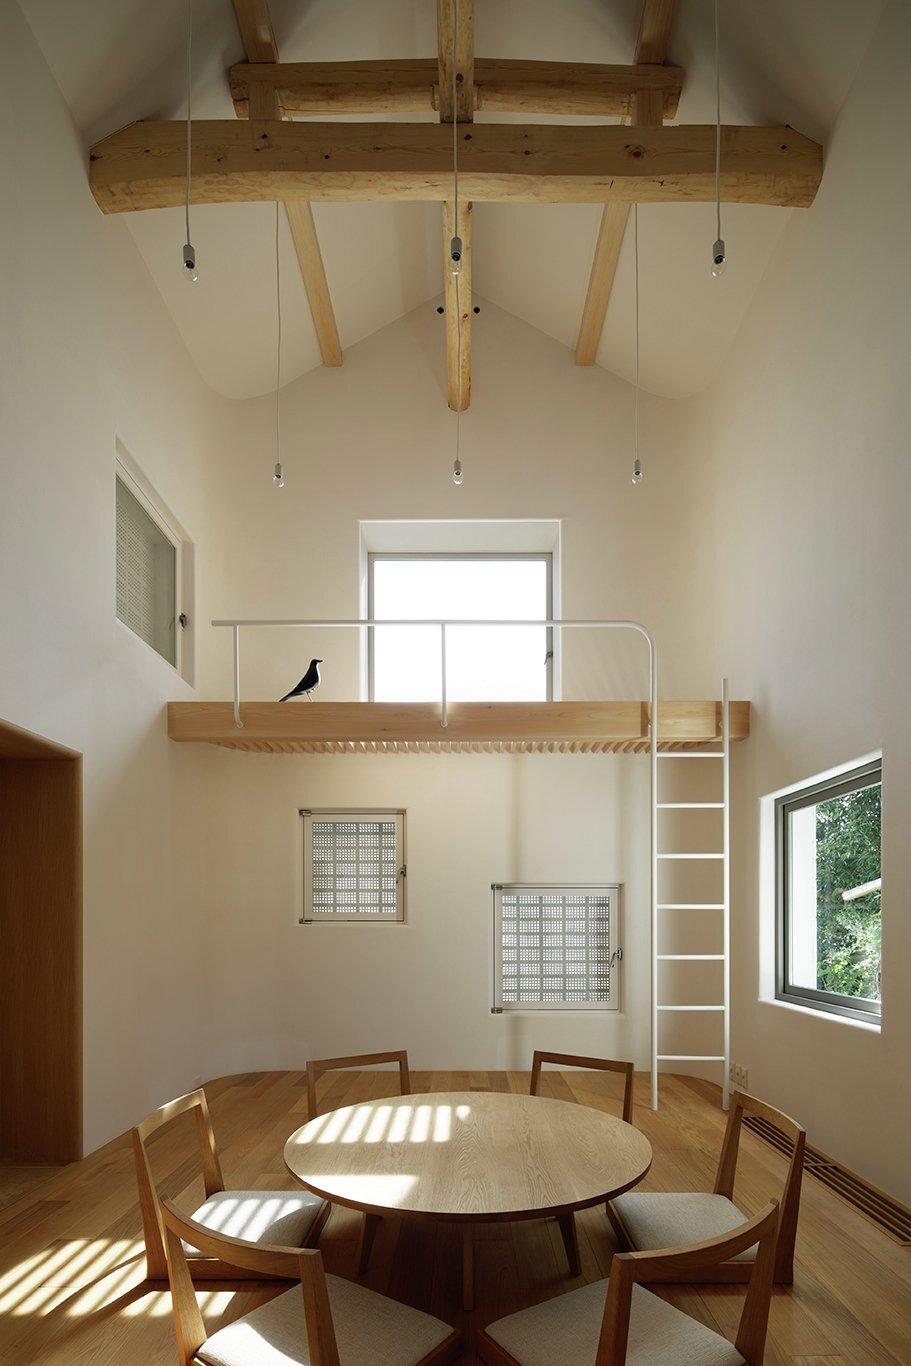 RebirthHouse - Ryo Matsui Architects - Japan - Dining Area - Humble Homes